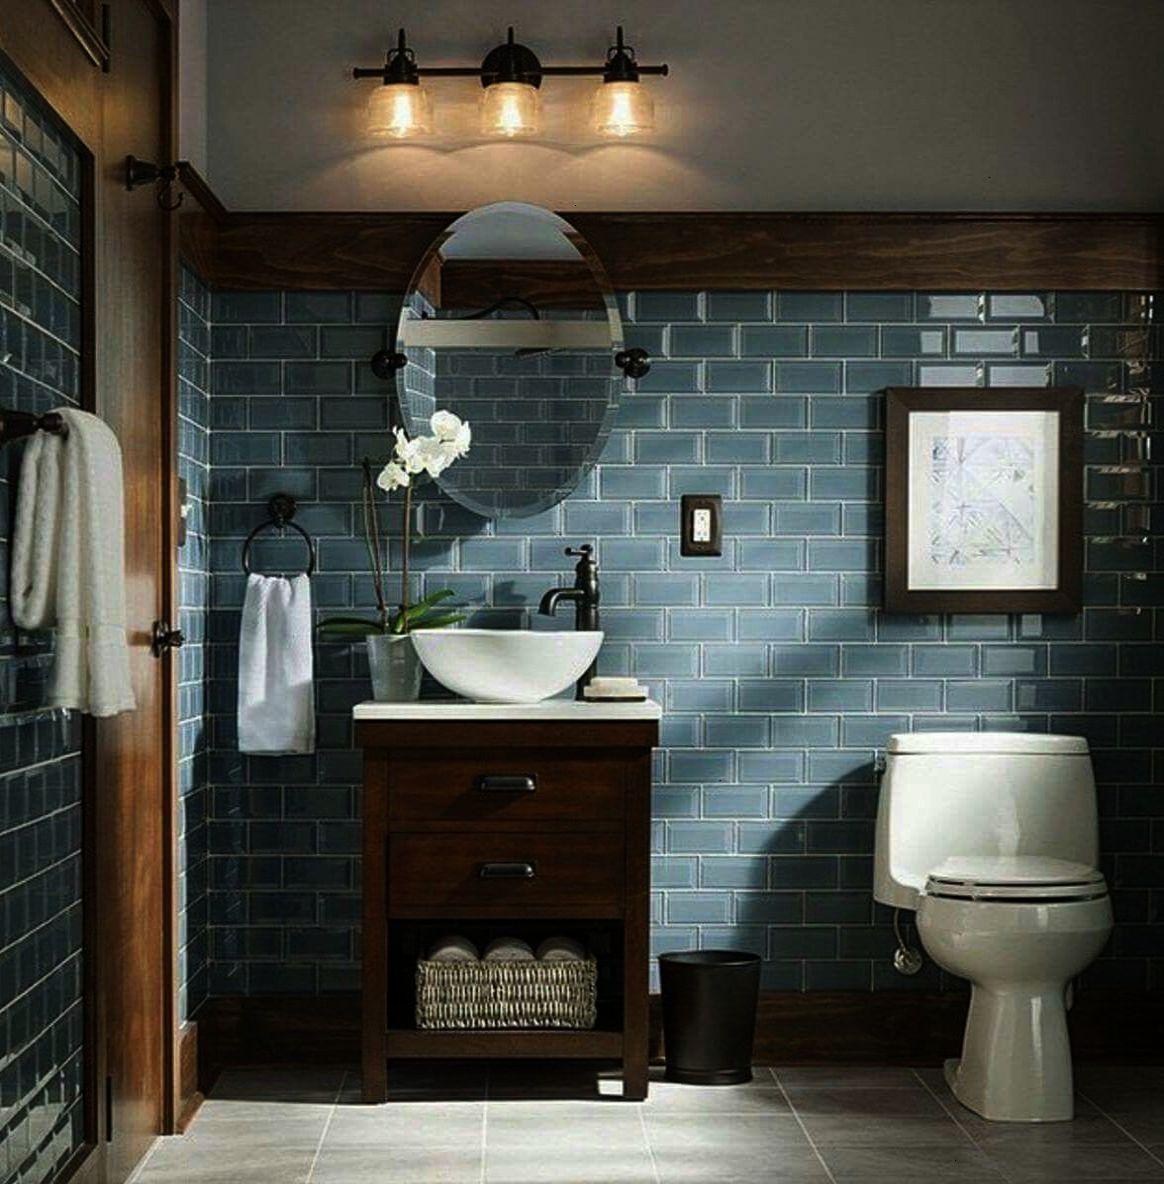 Rustic and Modern Bathroom Blue Grey Glass Tiles ... on Rustic Farmhouse Bathroom Tile  id=97124